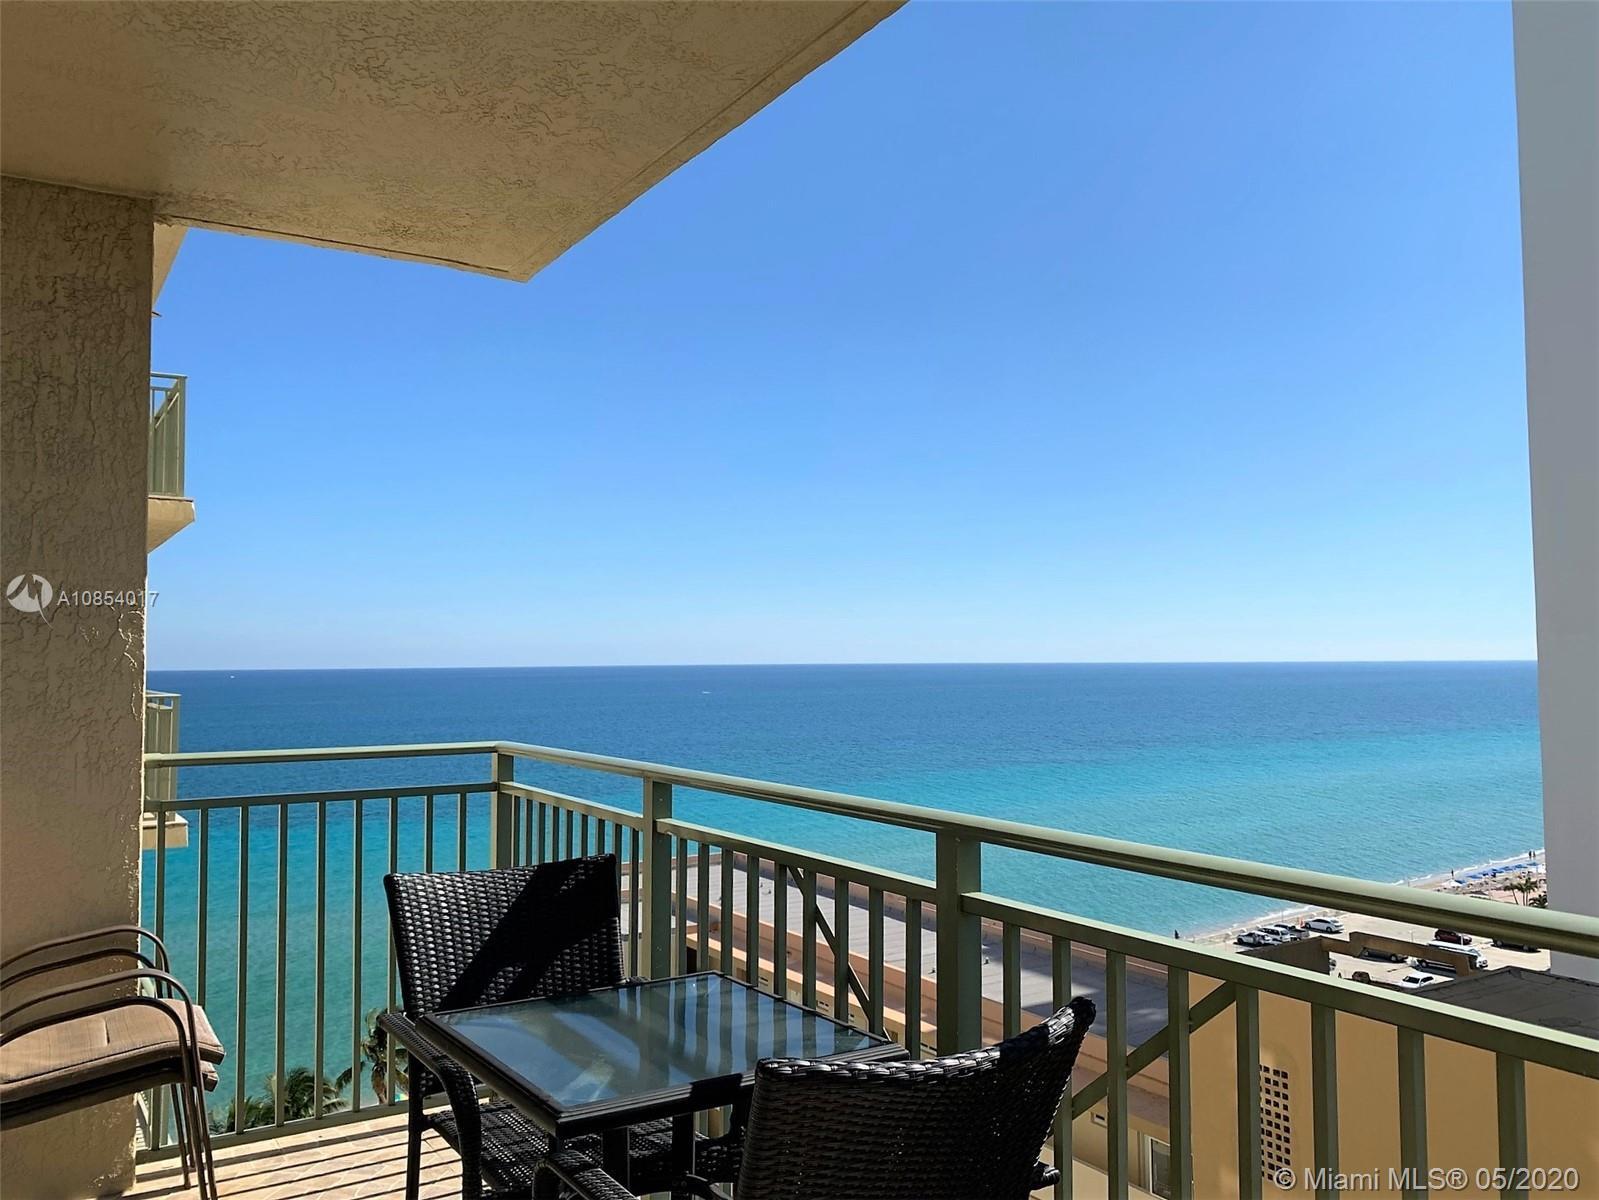 2080 Hallandale #1205 - 2080 S Ocean Dr #1205, Hallandale Beach, FL 33009